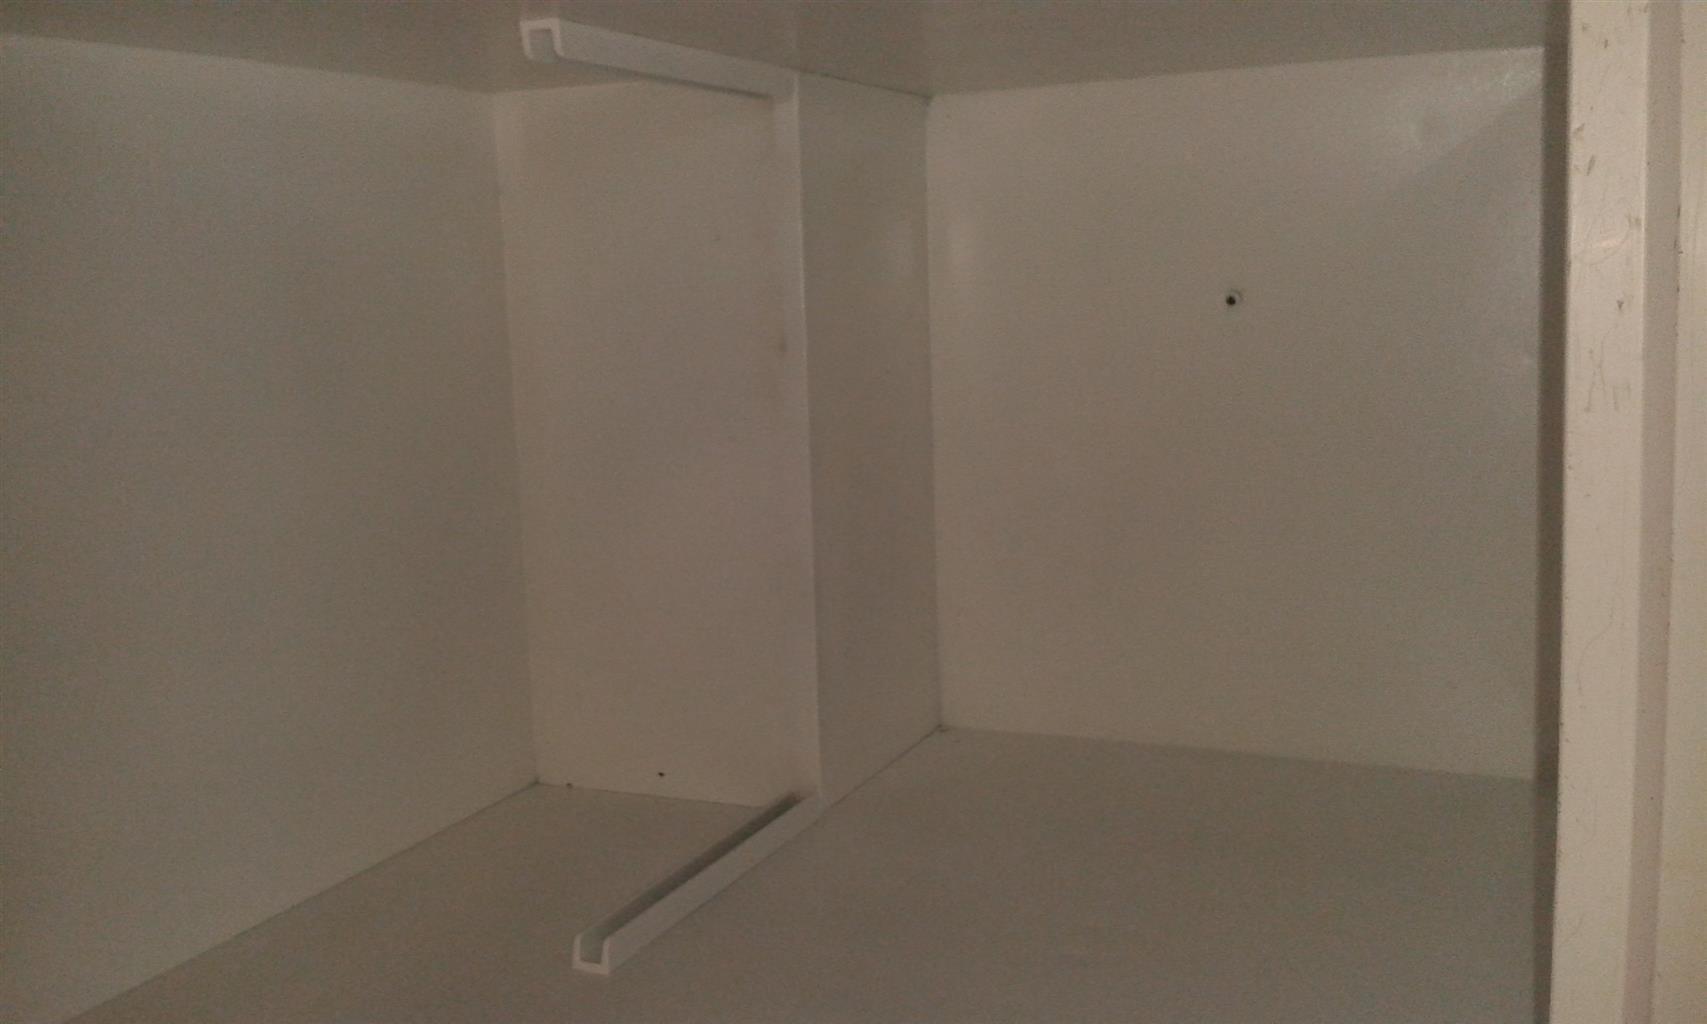 Freezer kic 225 lts R1650 and fridge with freezer fridge master R1750